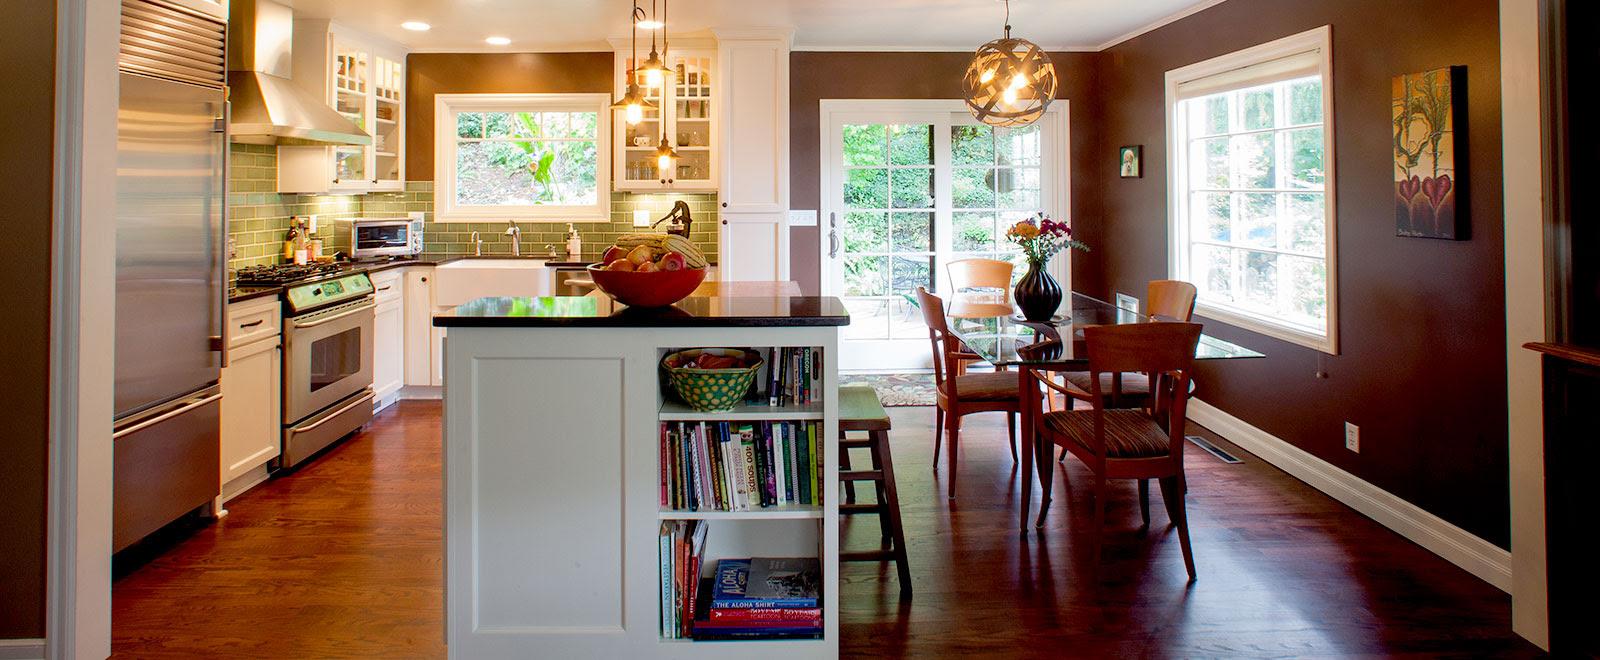 Top Interior Designer In Portland Or Karen Linder Interior